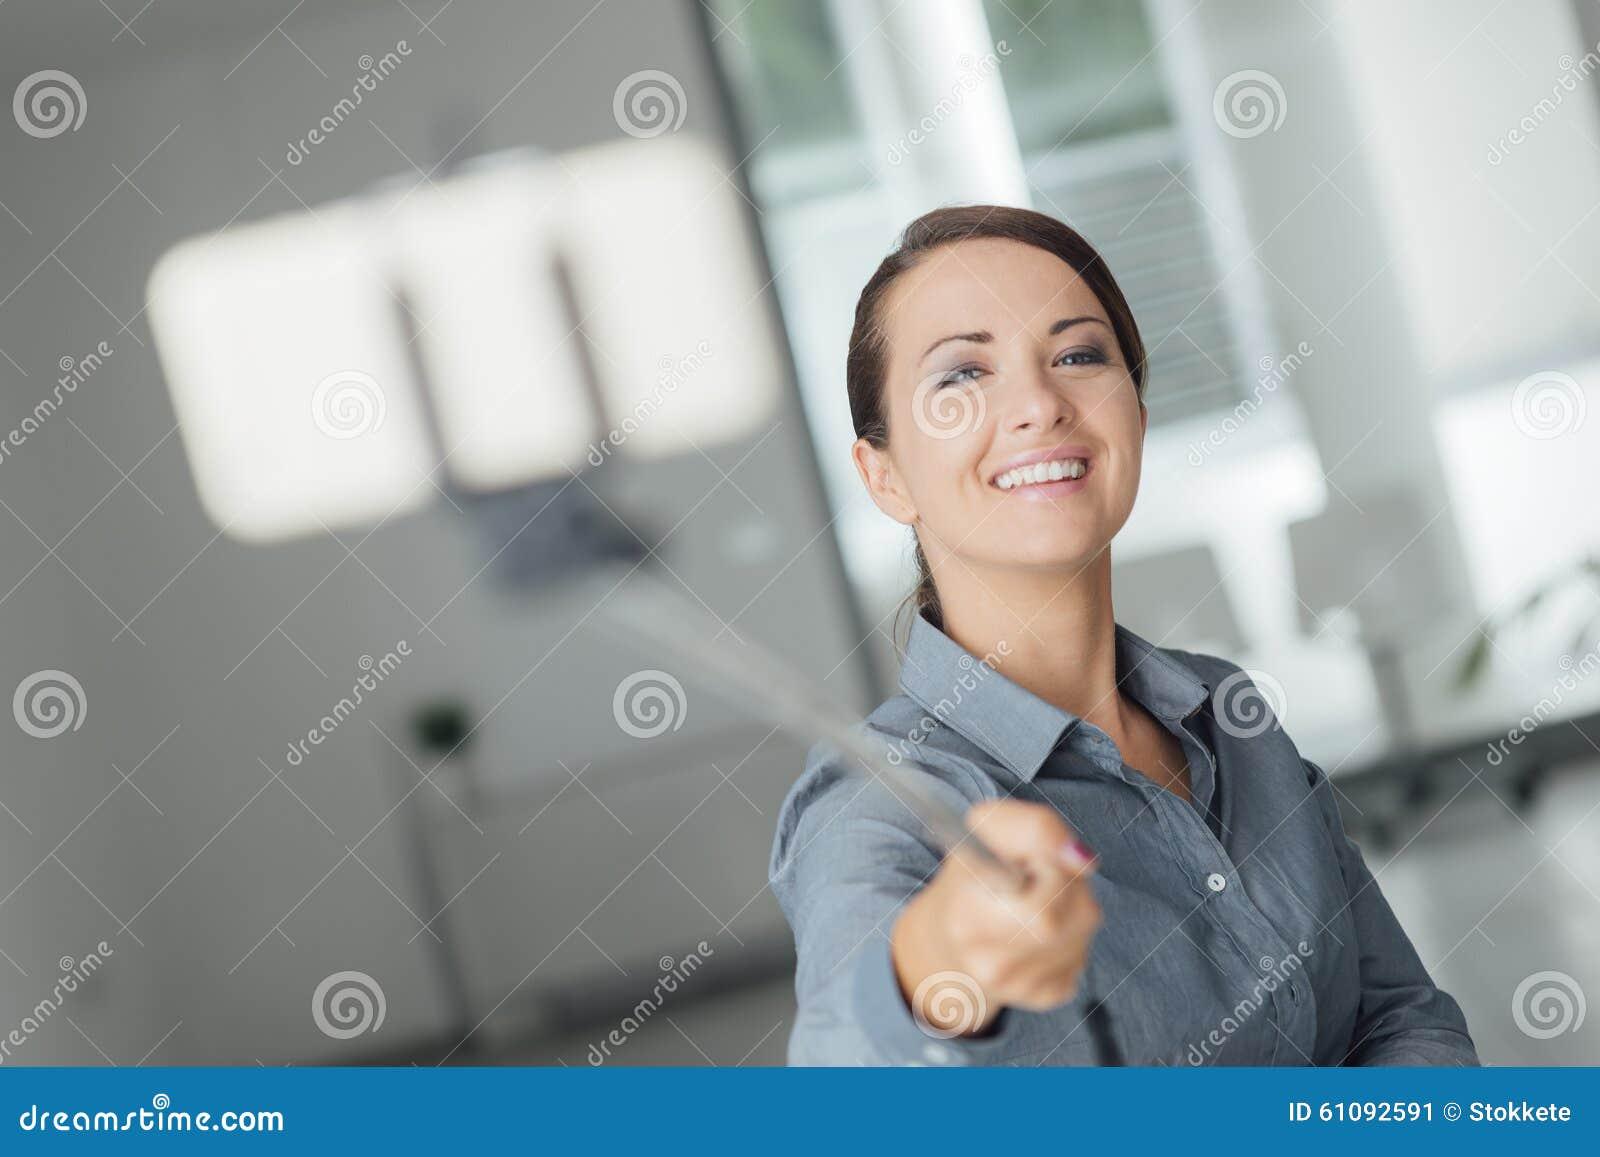 woman taking a self portrait using a selfie stick stock photo image 61092591. Black Bedroom Furniture Sets. Home Design Ideas